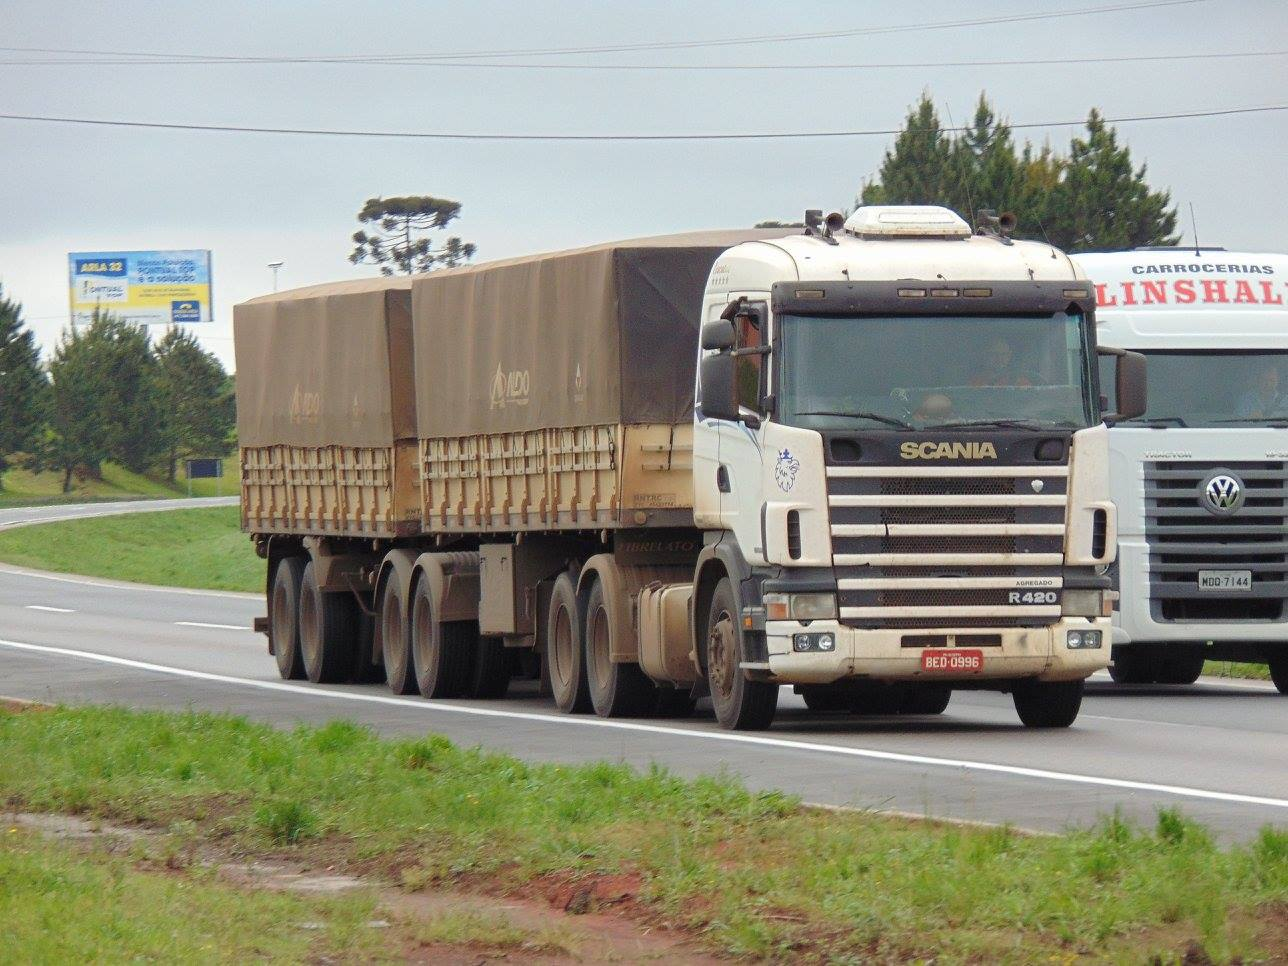 Scania-photo-5-1--2015-12